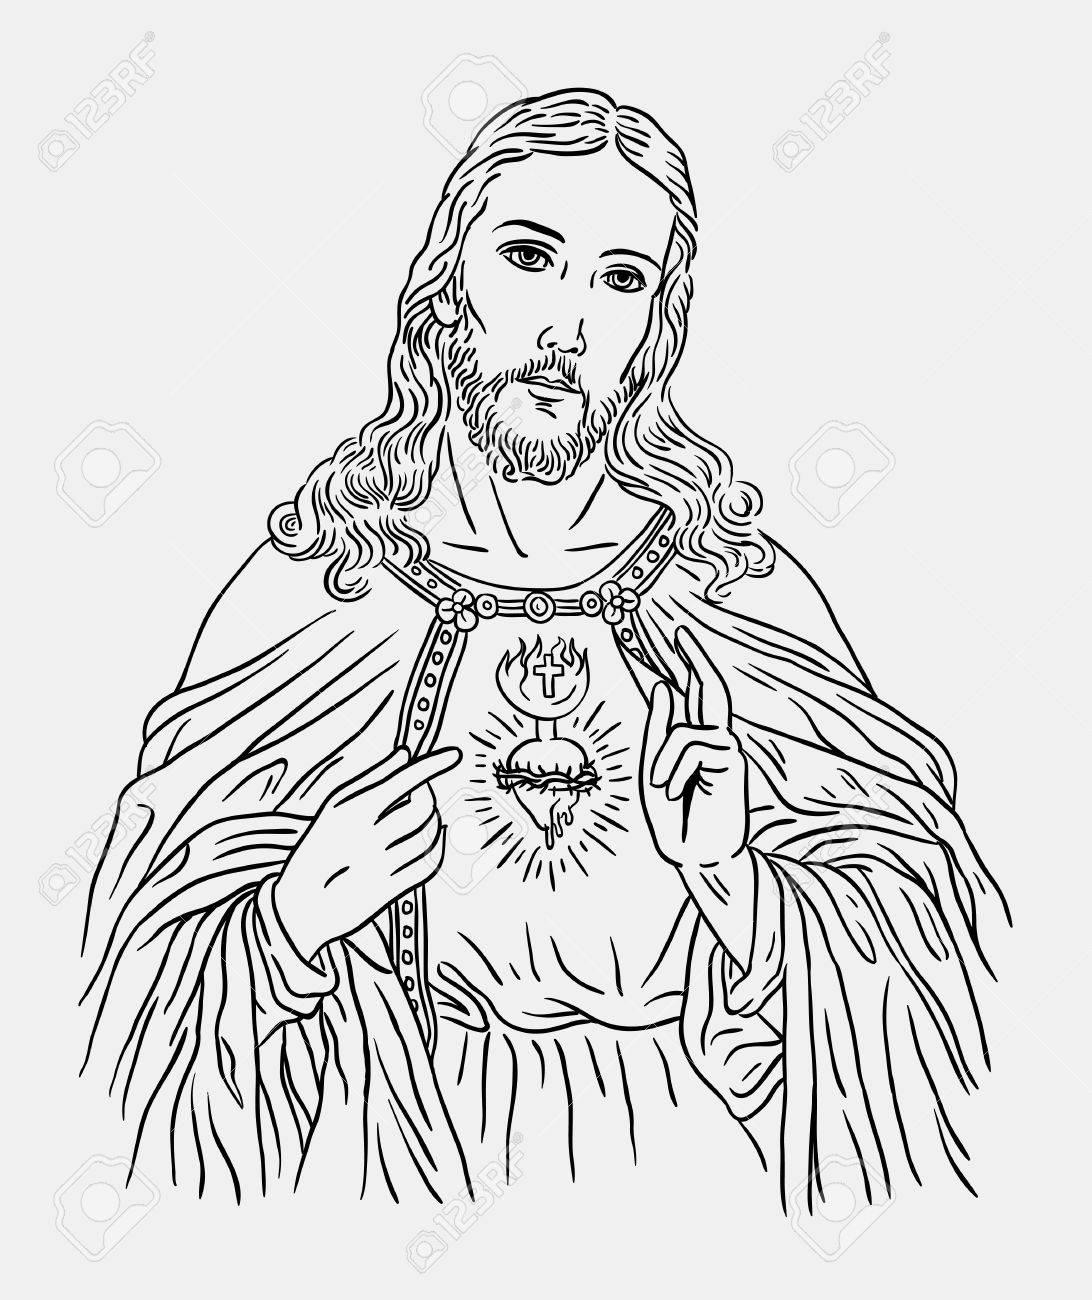 Line Drawing Of Jesus Christ Wiring Diagrams Harvester Public Circuit Online Simulator Docircuits Catholic Religion Art Style Good Use Rh 123rf Com On The Cross